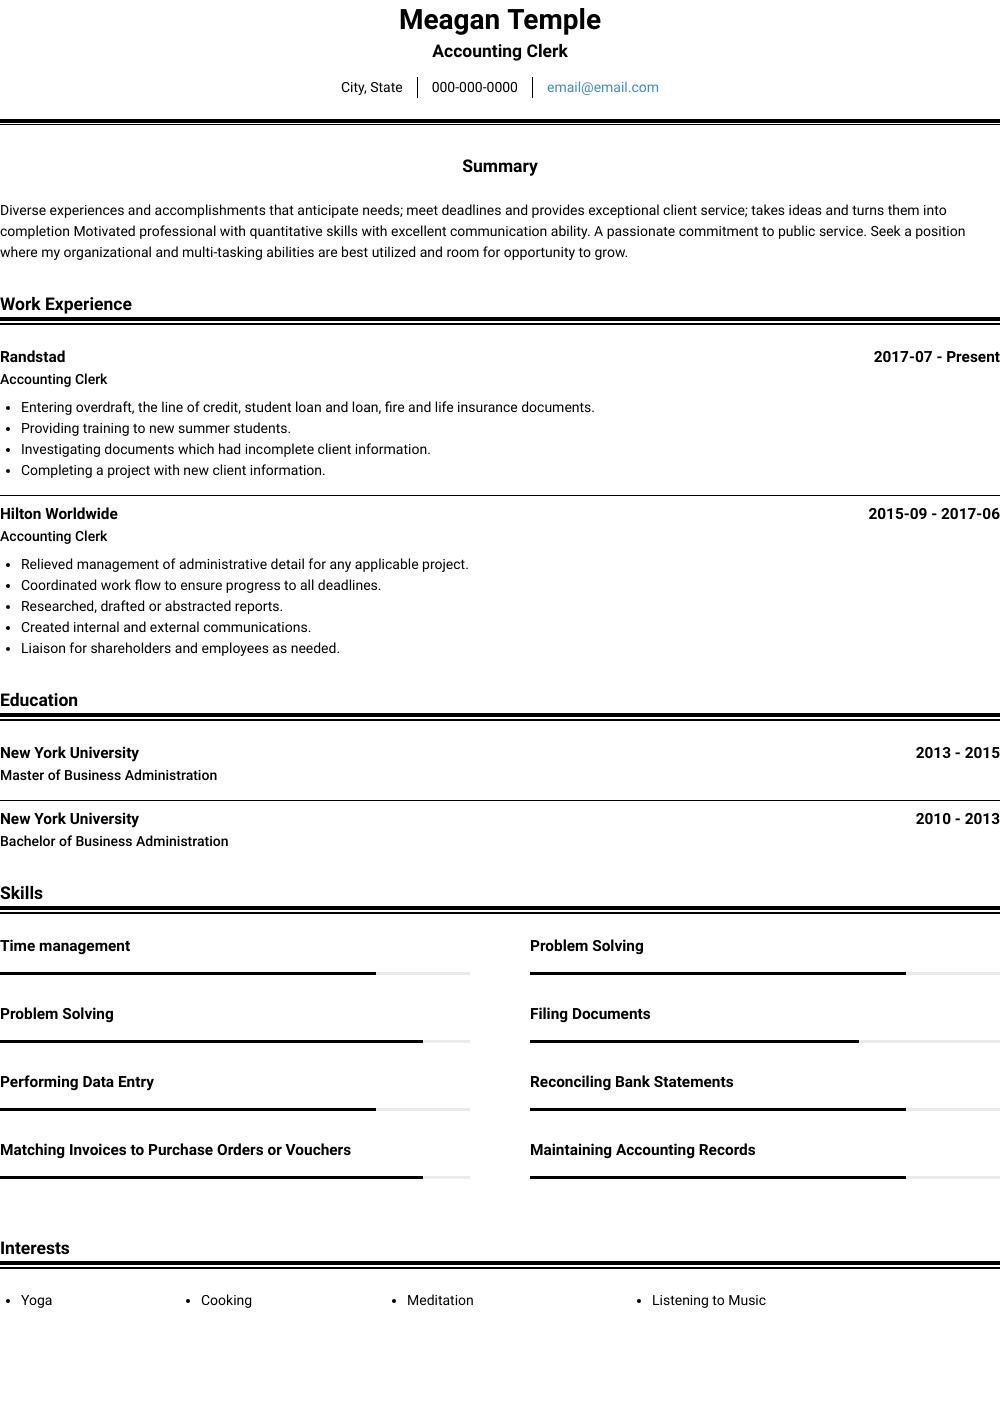 Accounting Clerk  Resume Samples  Templates  VisualCV